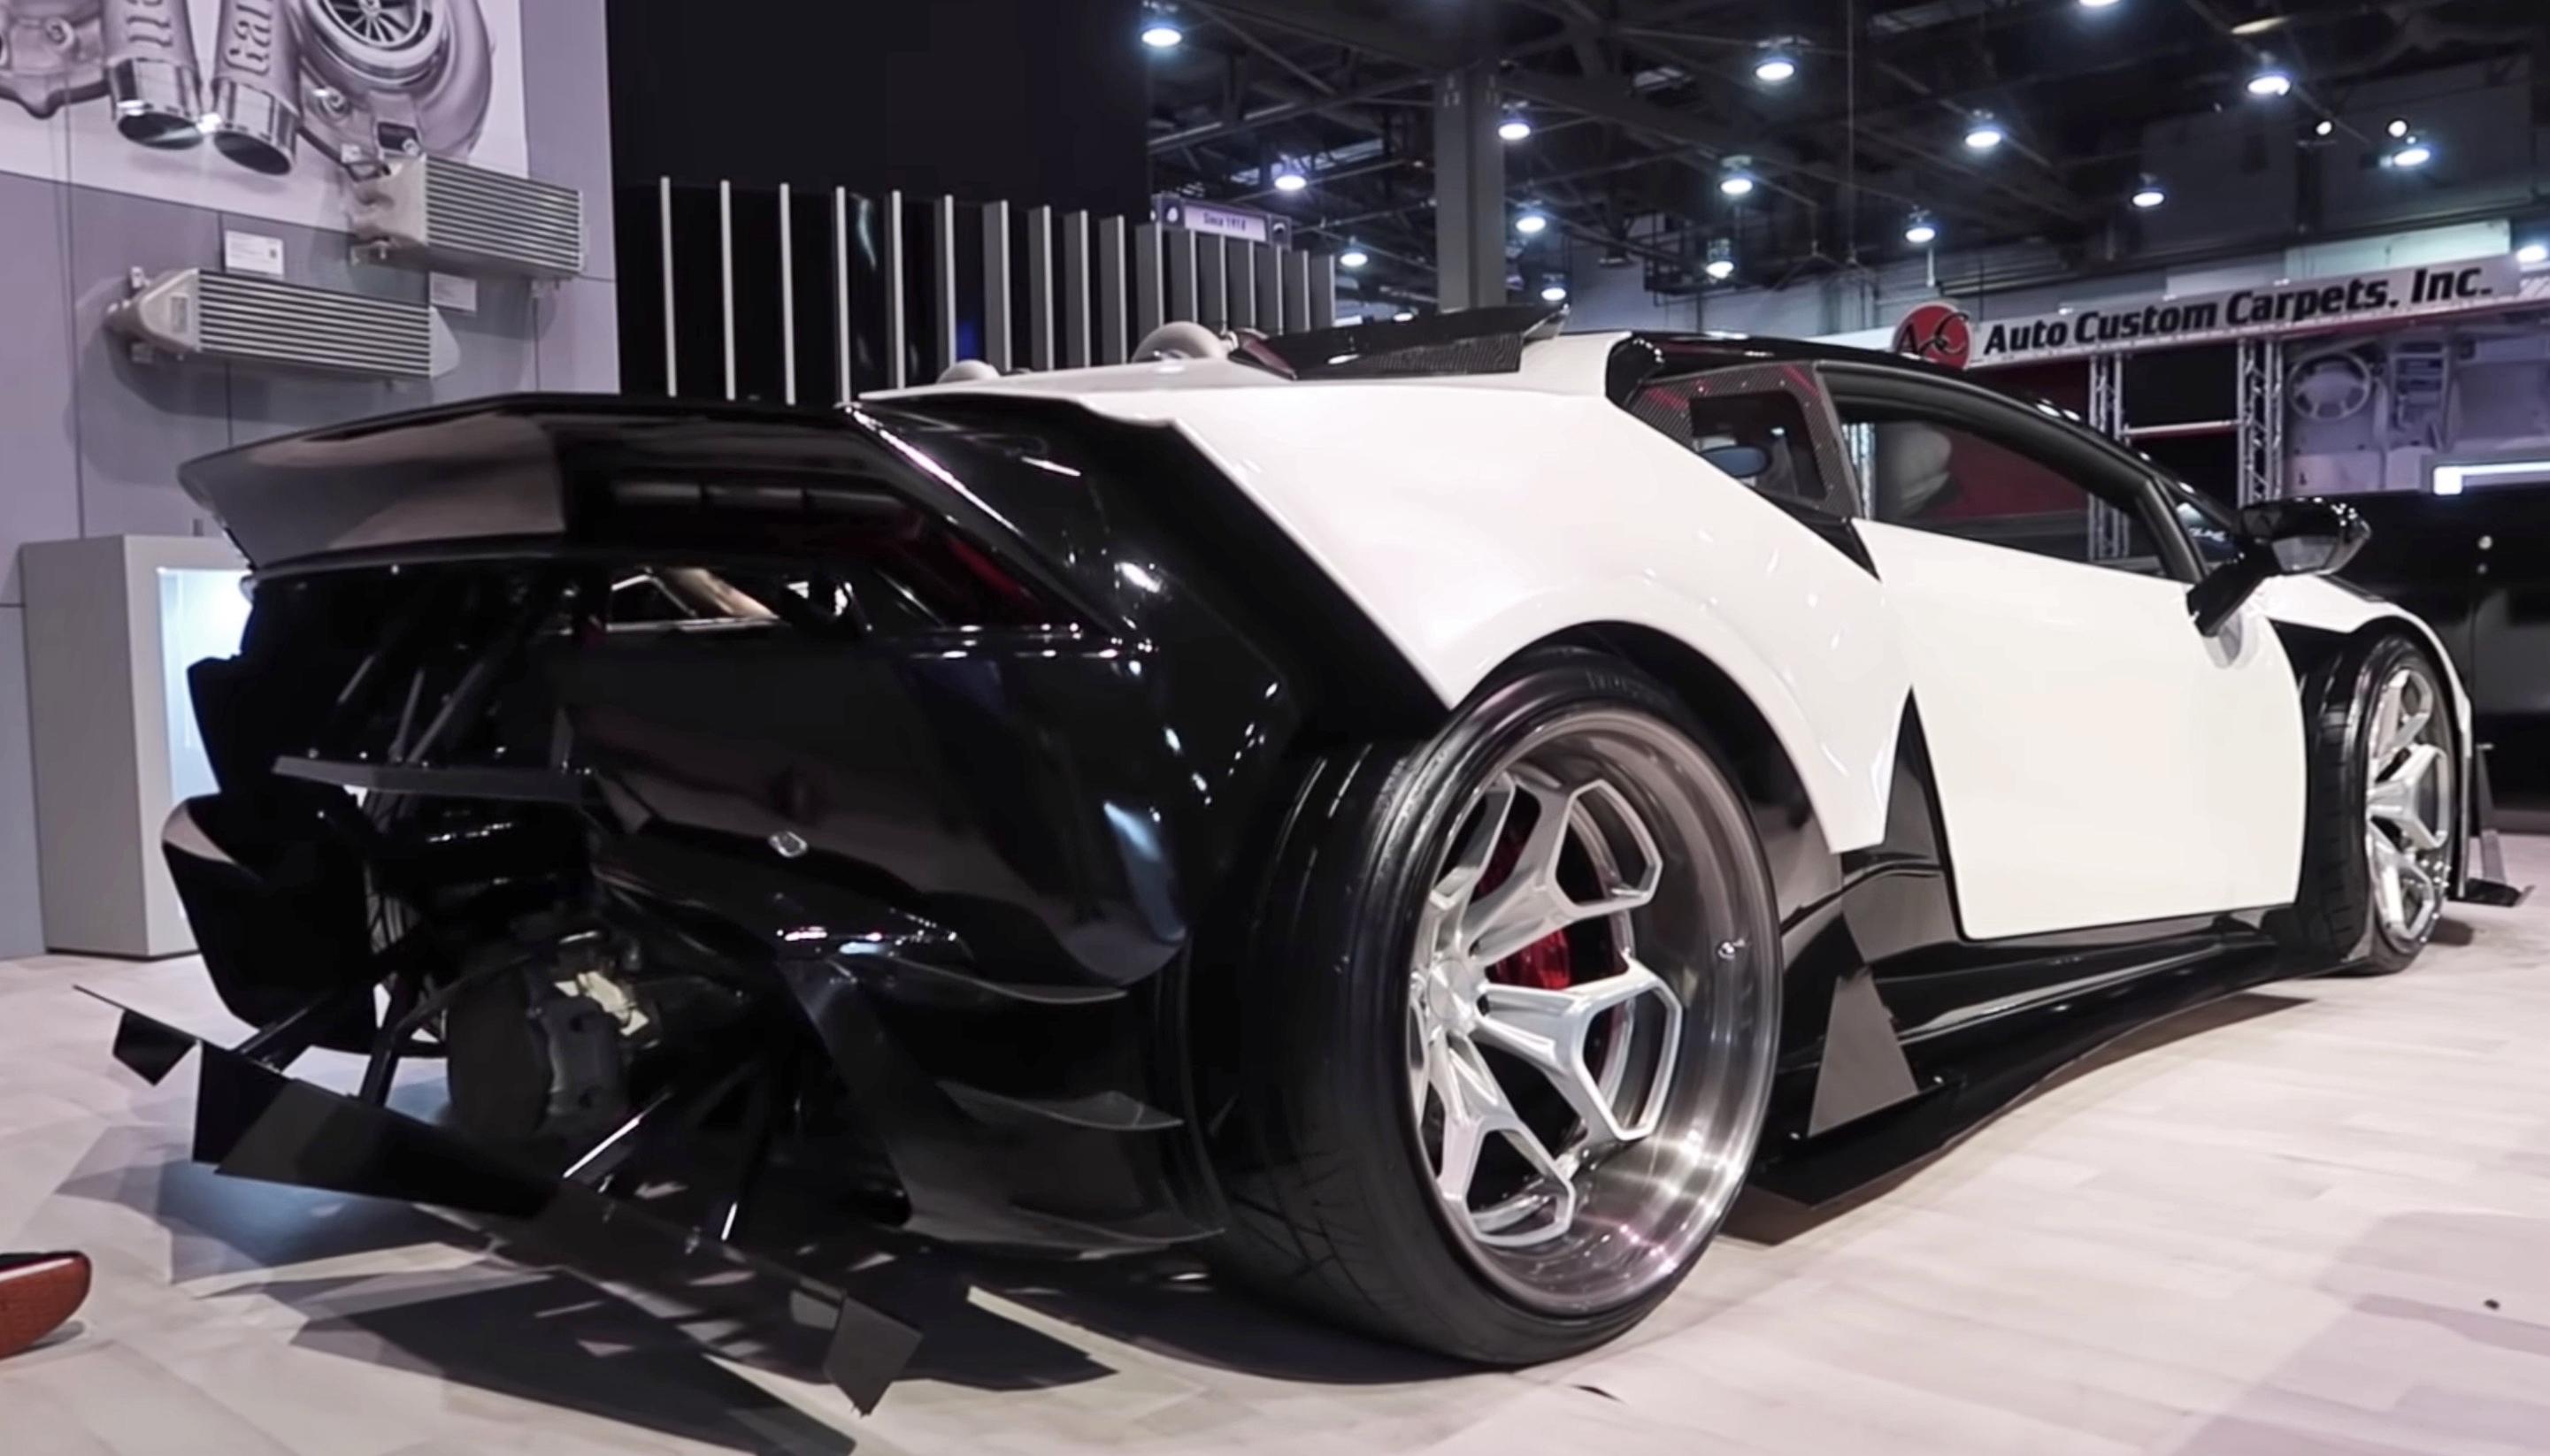 LS swapped Lamborghini